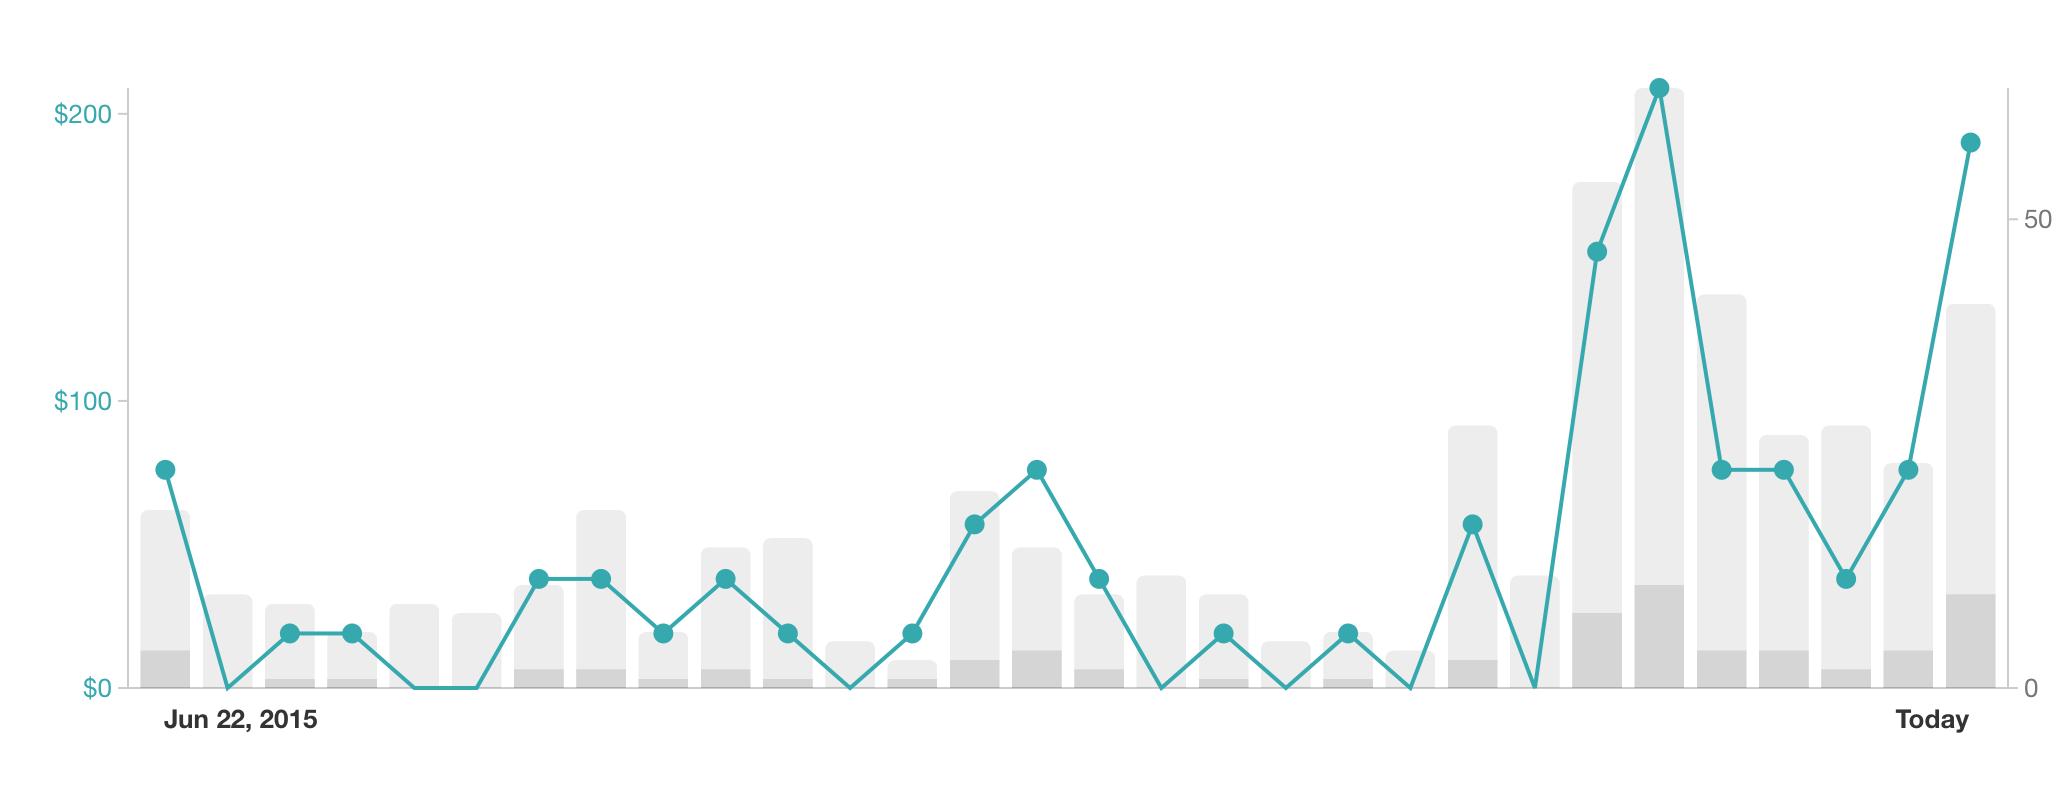 JFS sales chart a few days later